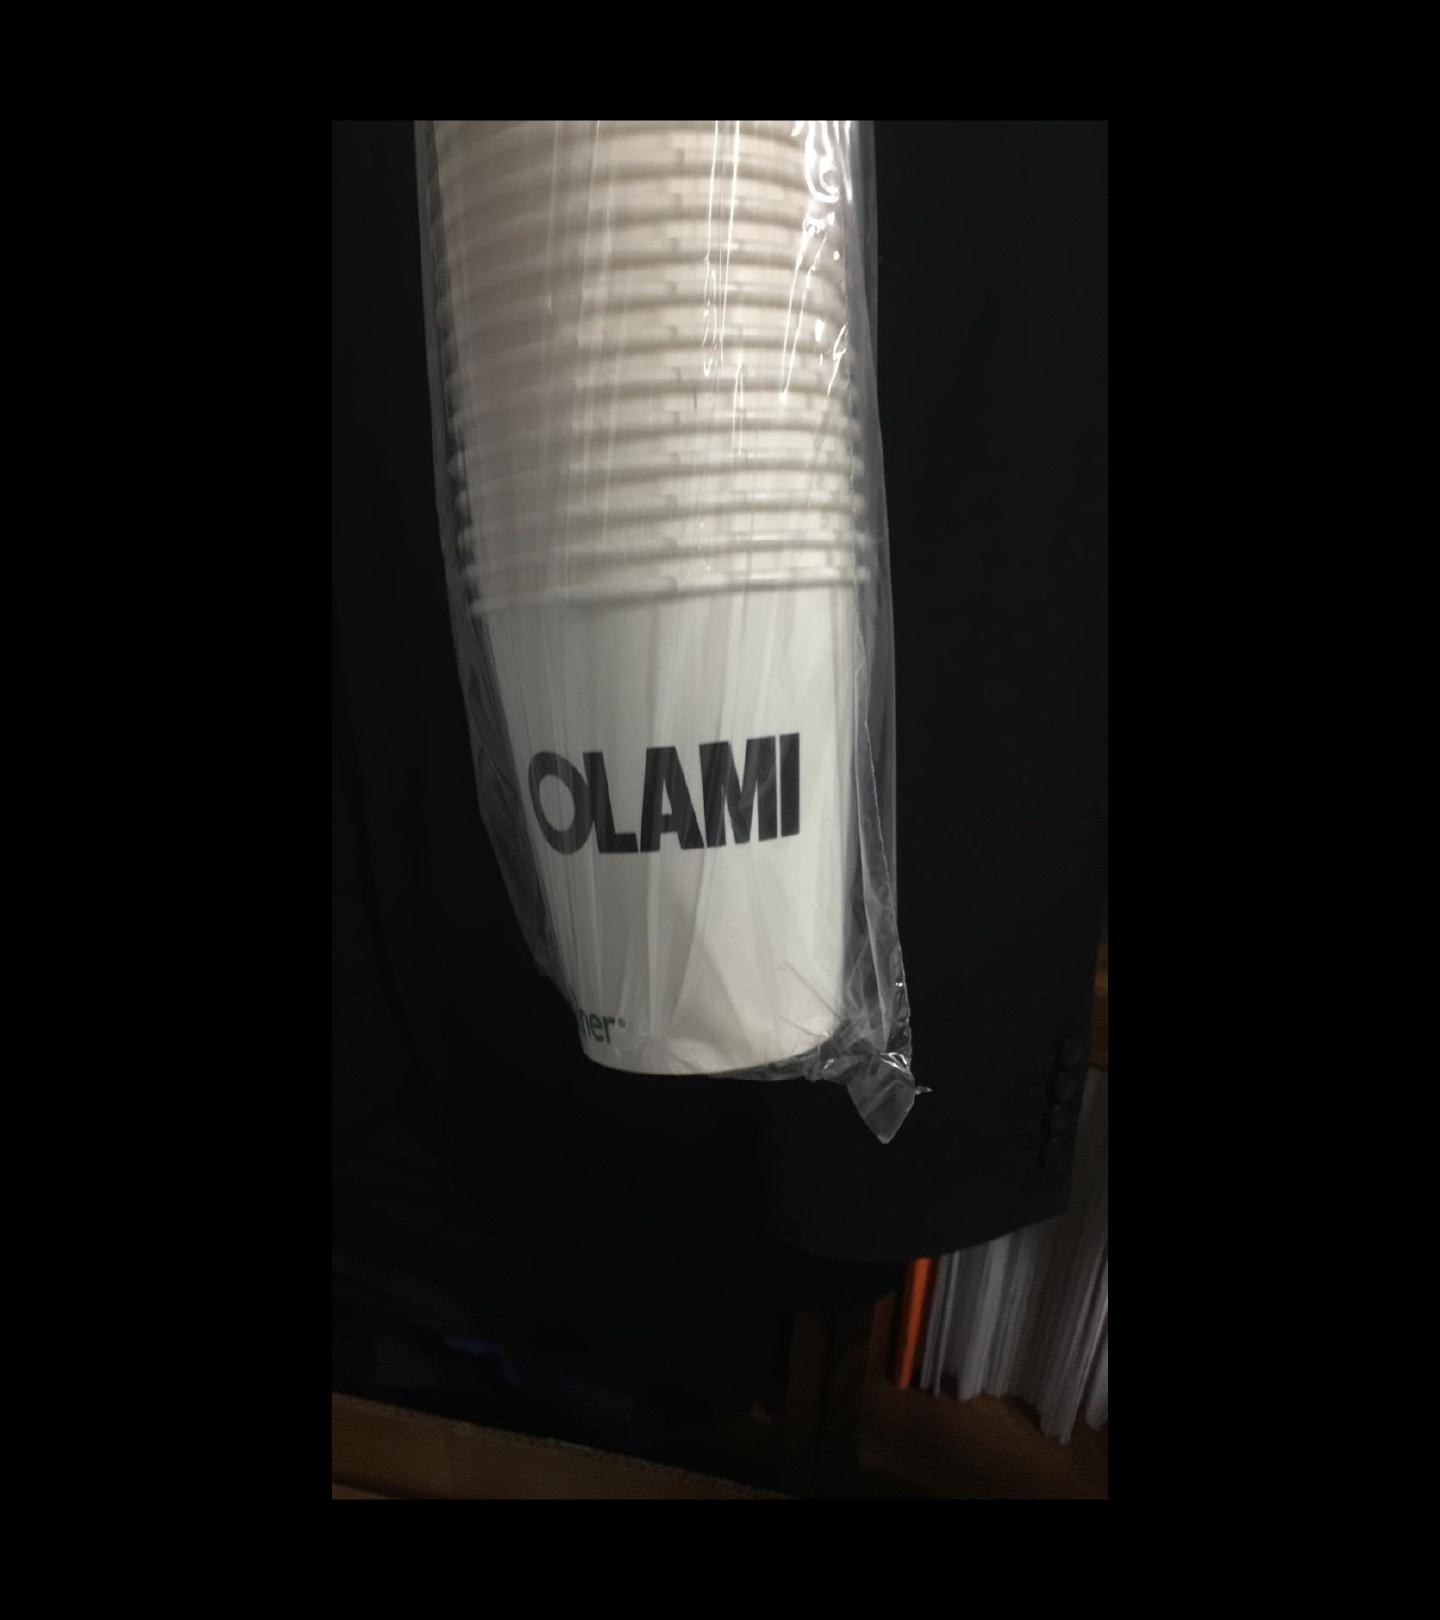 Olami-1-copy-3j